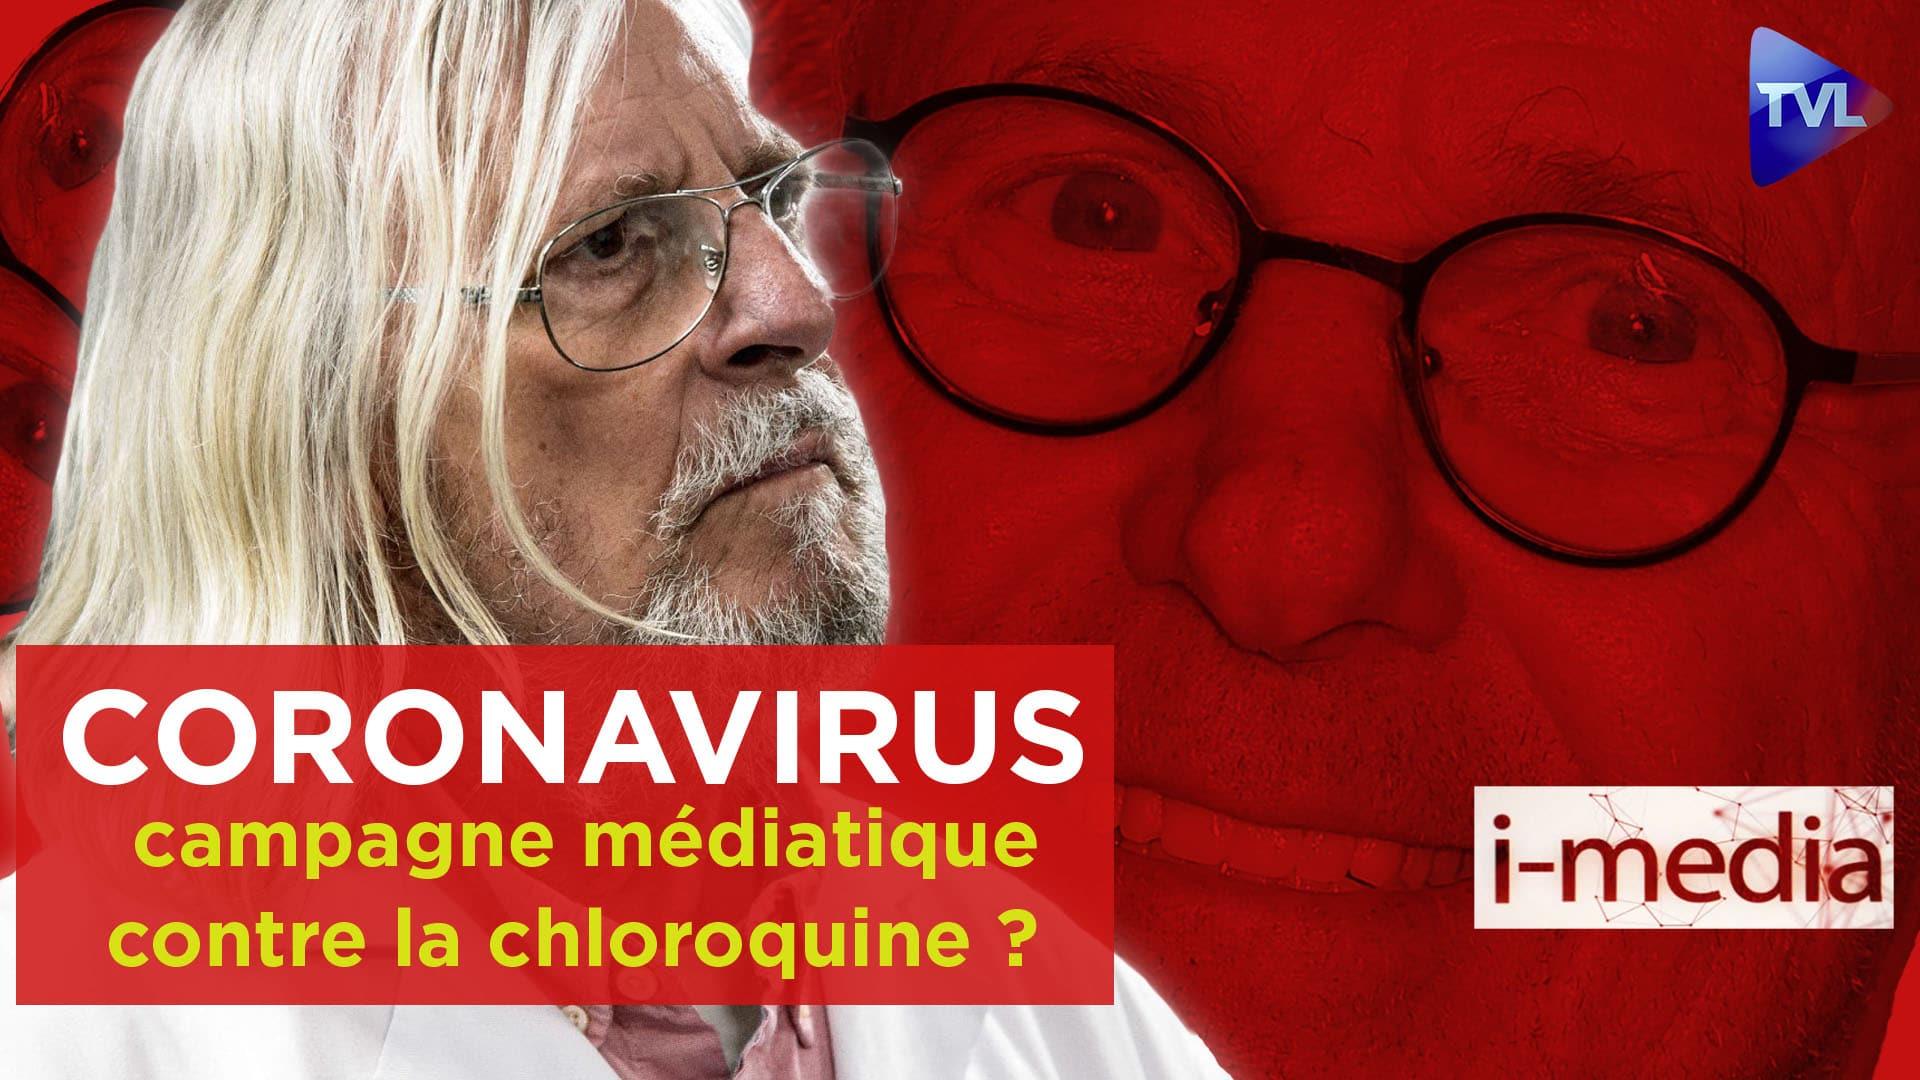 I-Média n°292 – Covid-19. Campagne médiatique contre la chloroquine ?